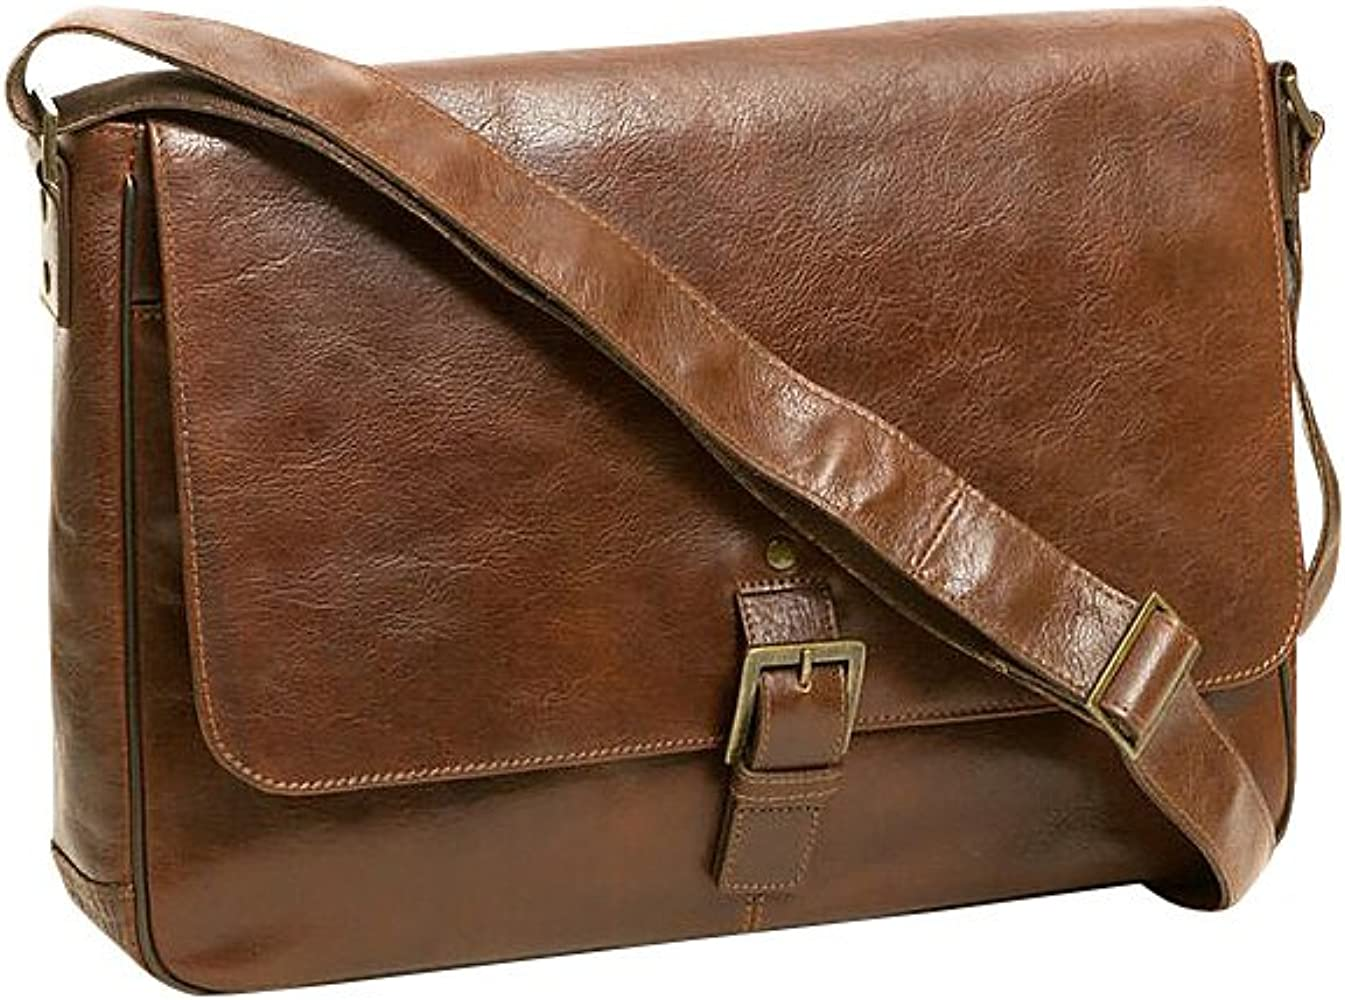 FeliciaJuan Mens and Womens Leather Business Briefcase 15.6-inch Laptop Notebook Messenger Bag Shoulder Messenger Bag